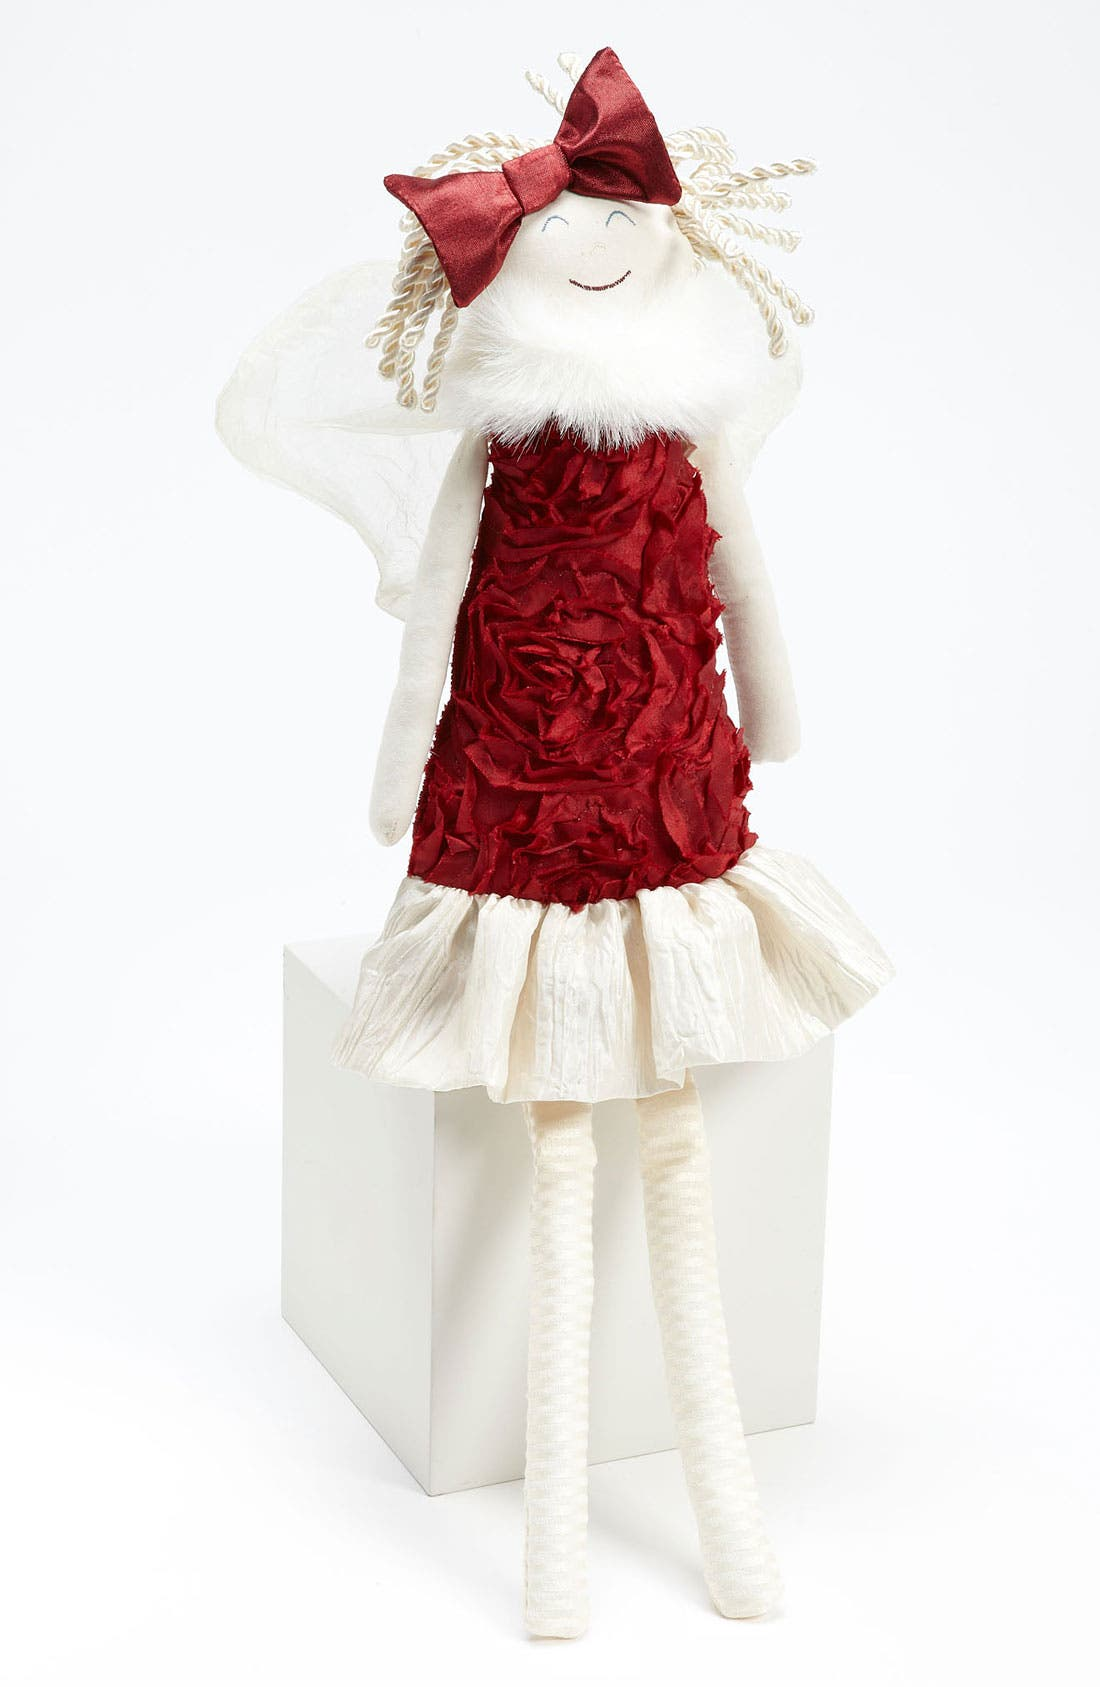 Main Image - Woof & Poof 'Medium' Sugar Plum Fairy Decoration